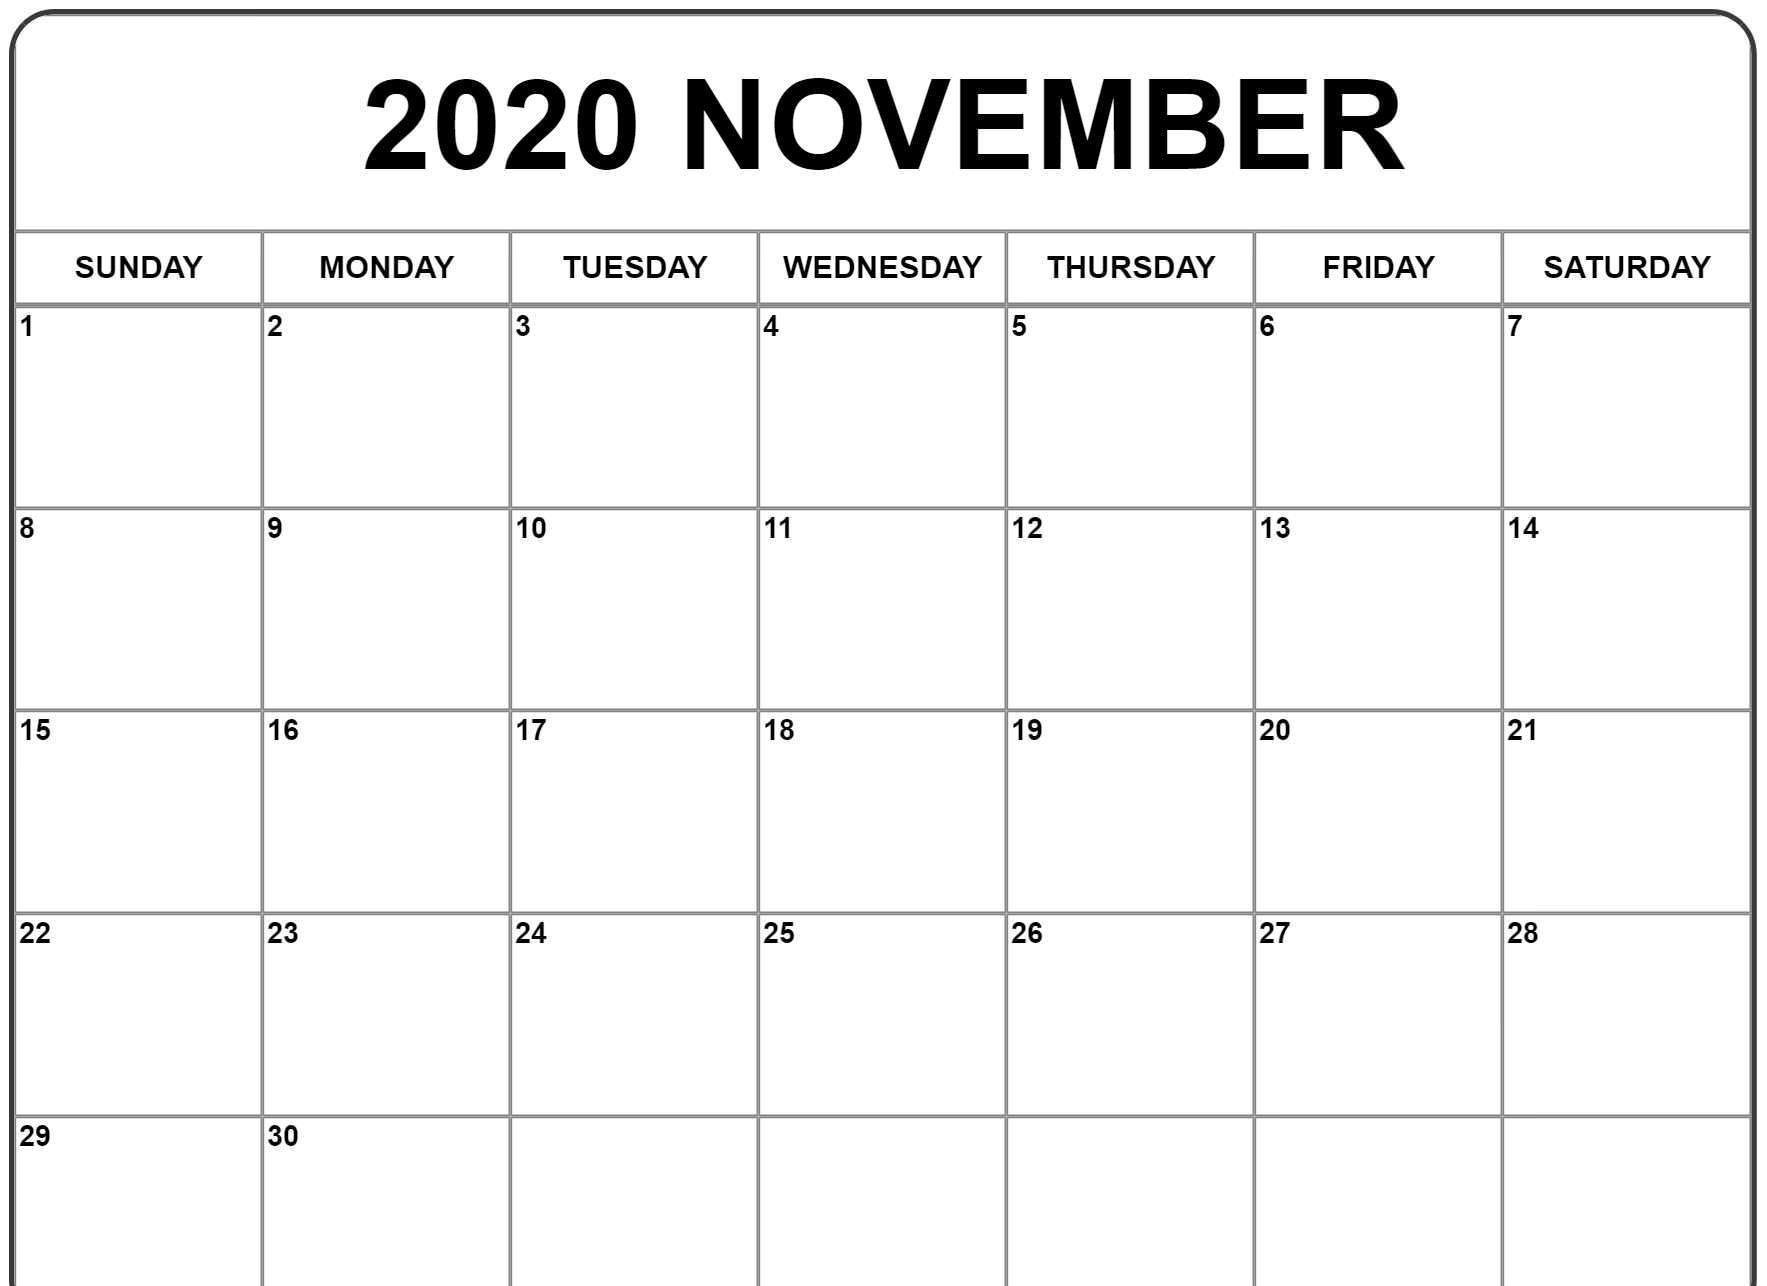 000 Archaicawful Printable Calendar Template November 2020 Highest Quality  FreeFull